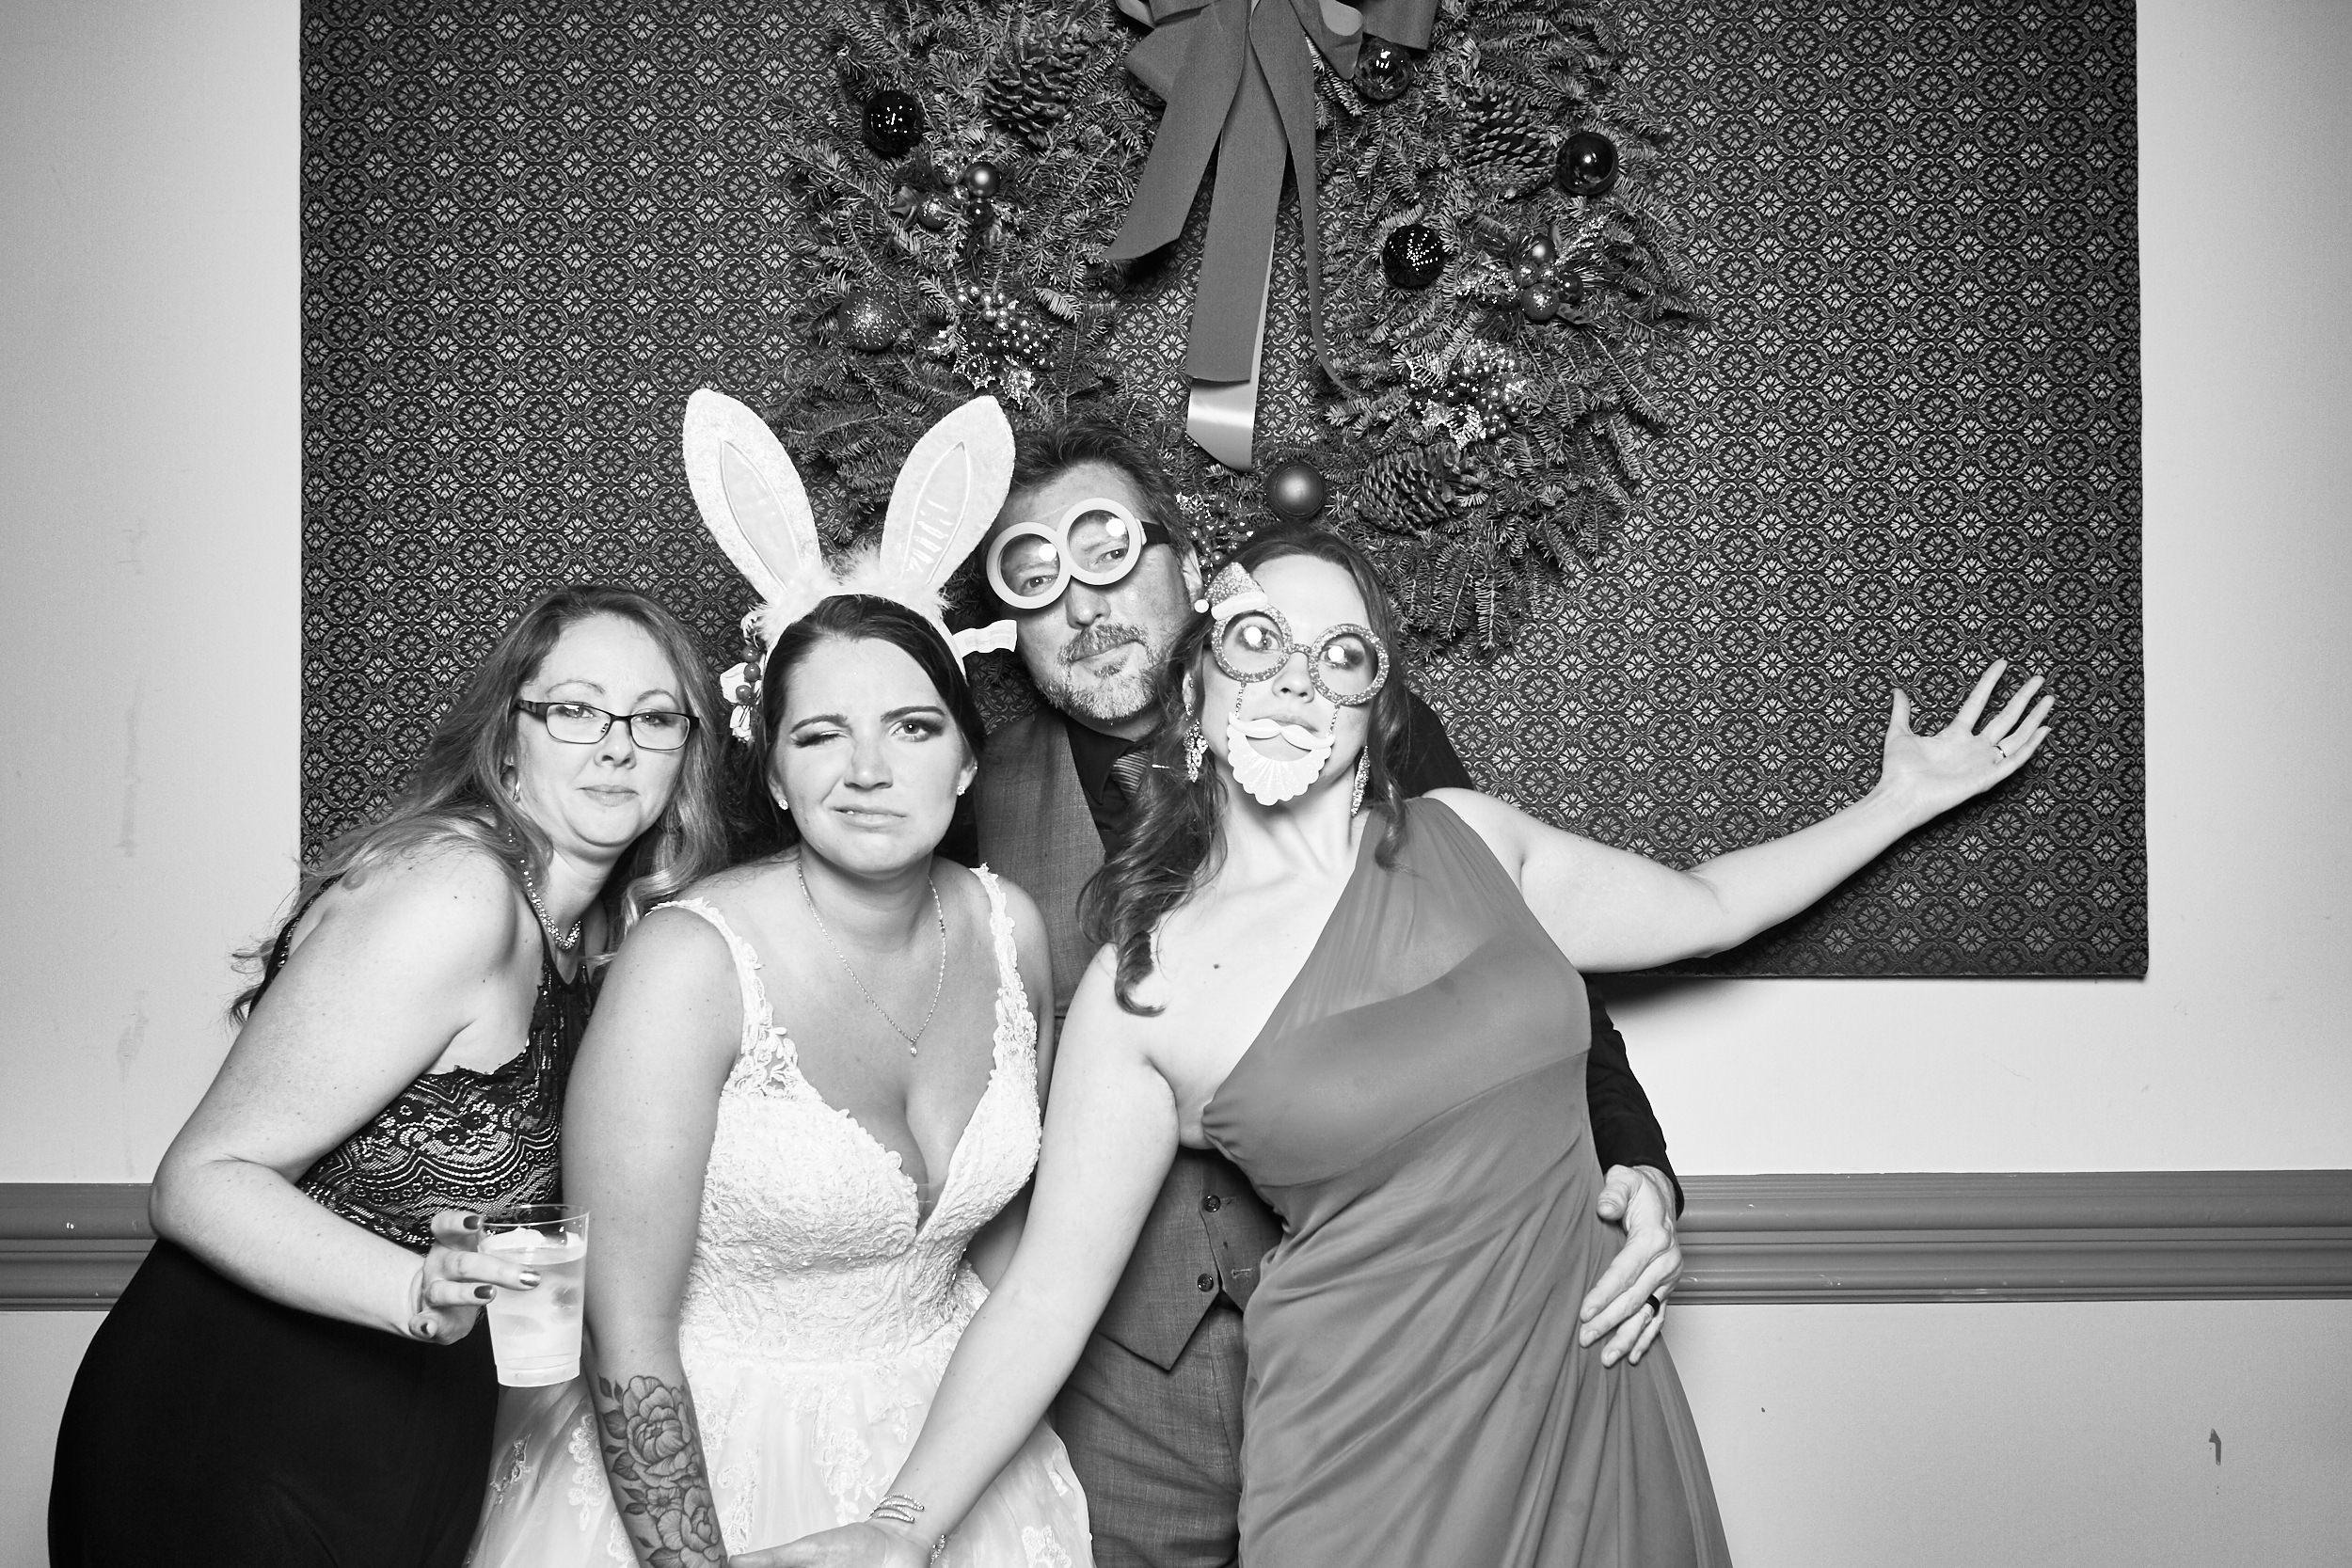 Alexa-James-Wedding-Photo-Booth1002.jpg